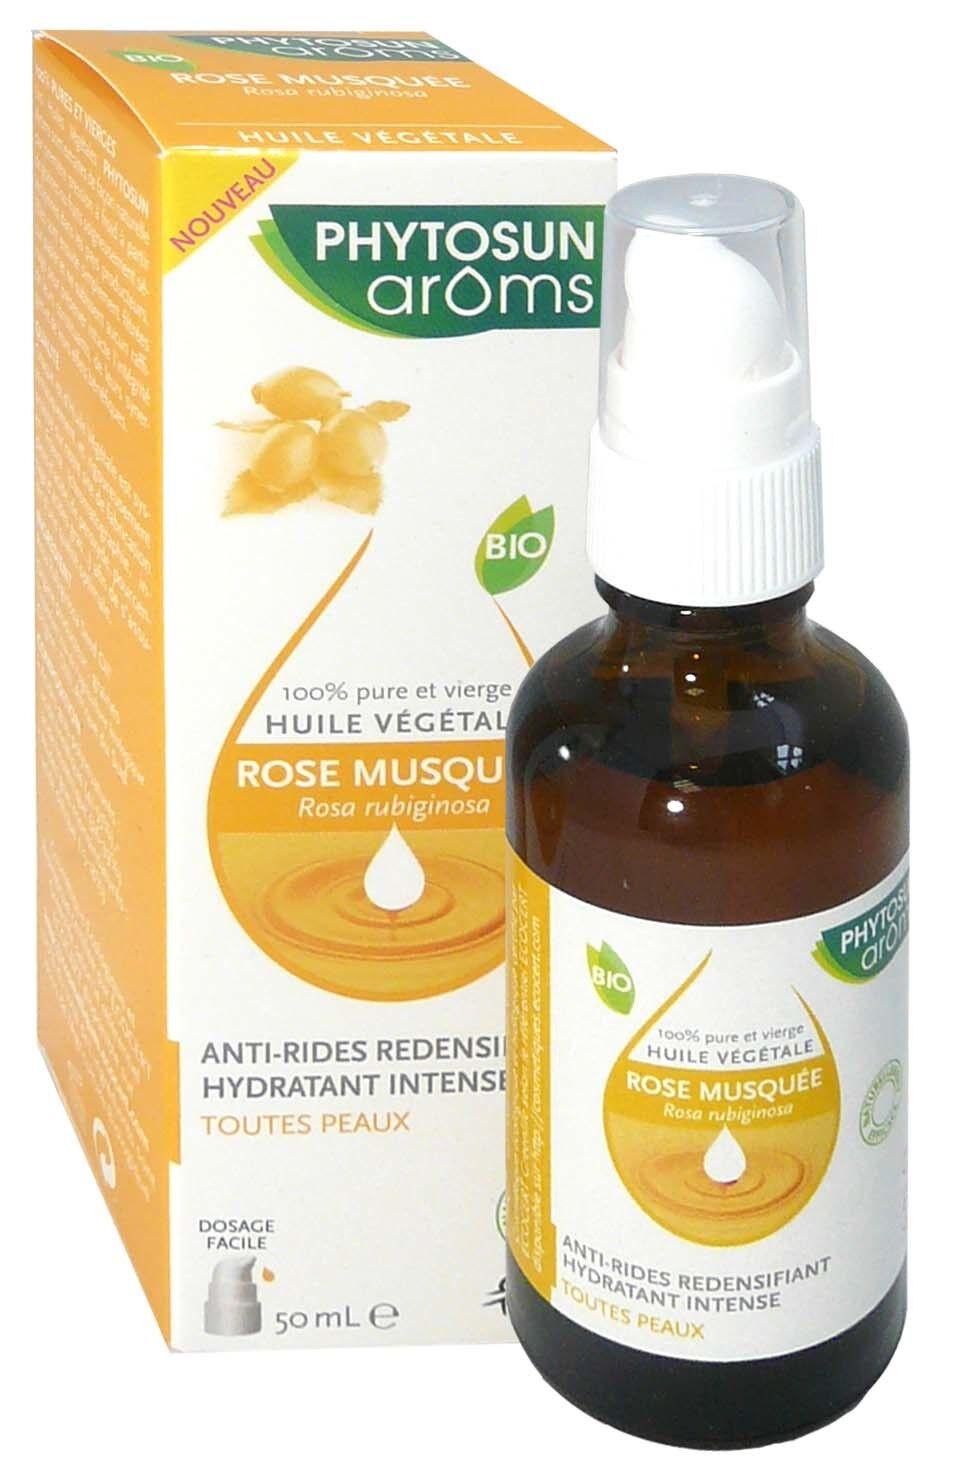 Phytosun aroms huile vegetale rose musquee 50ml